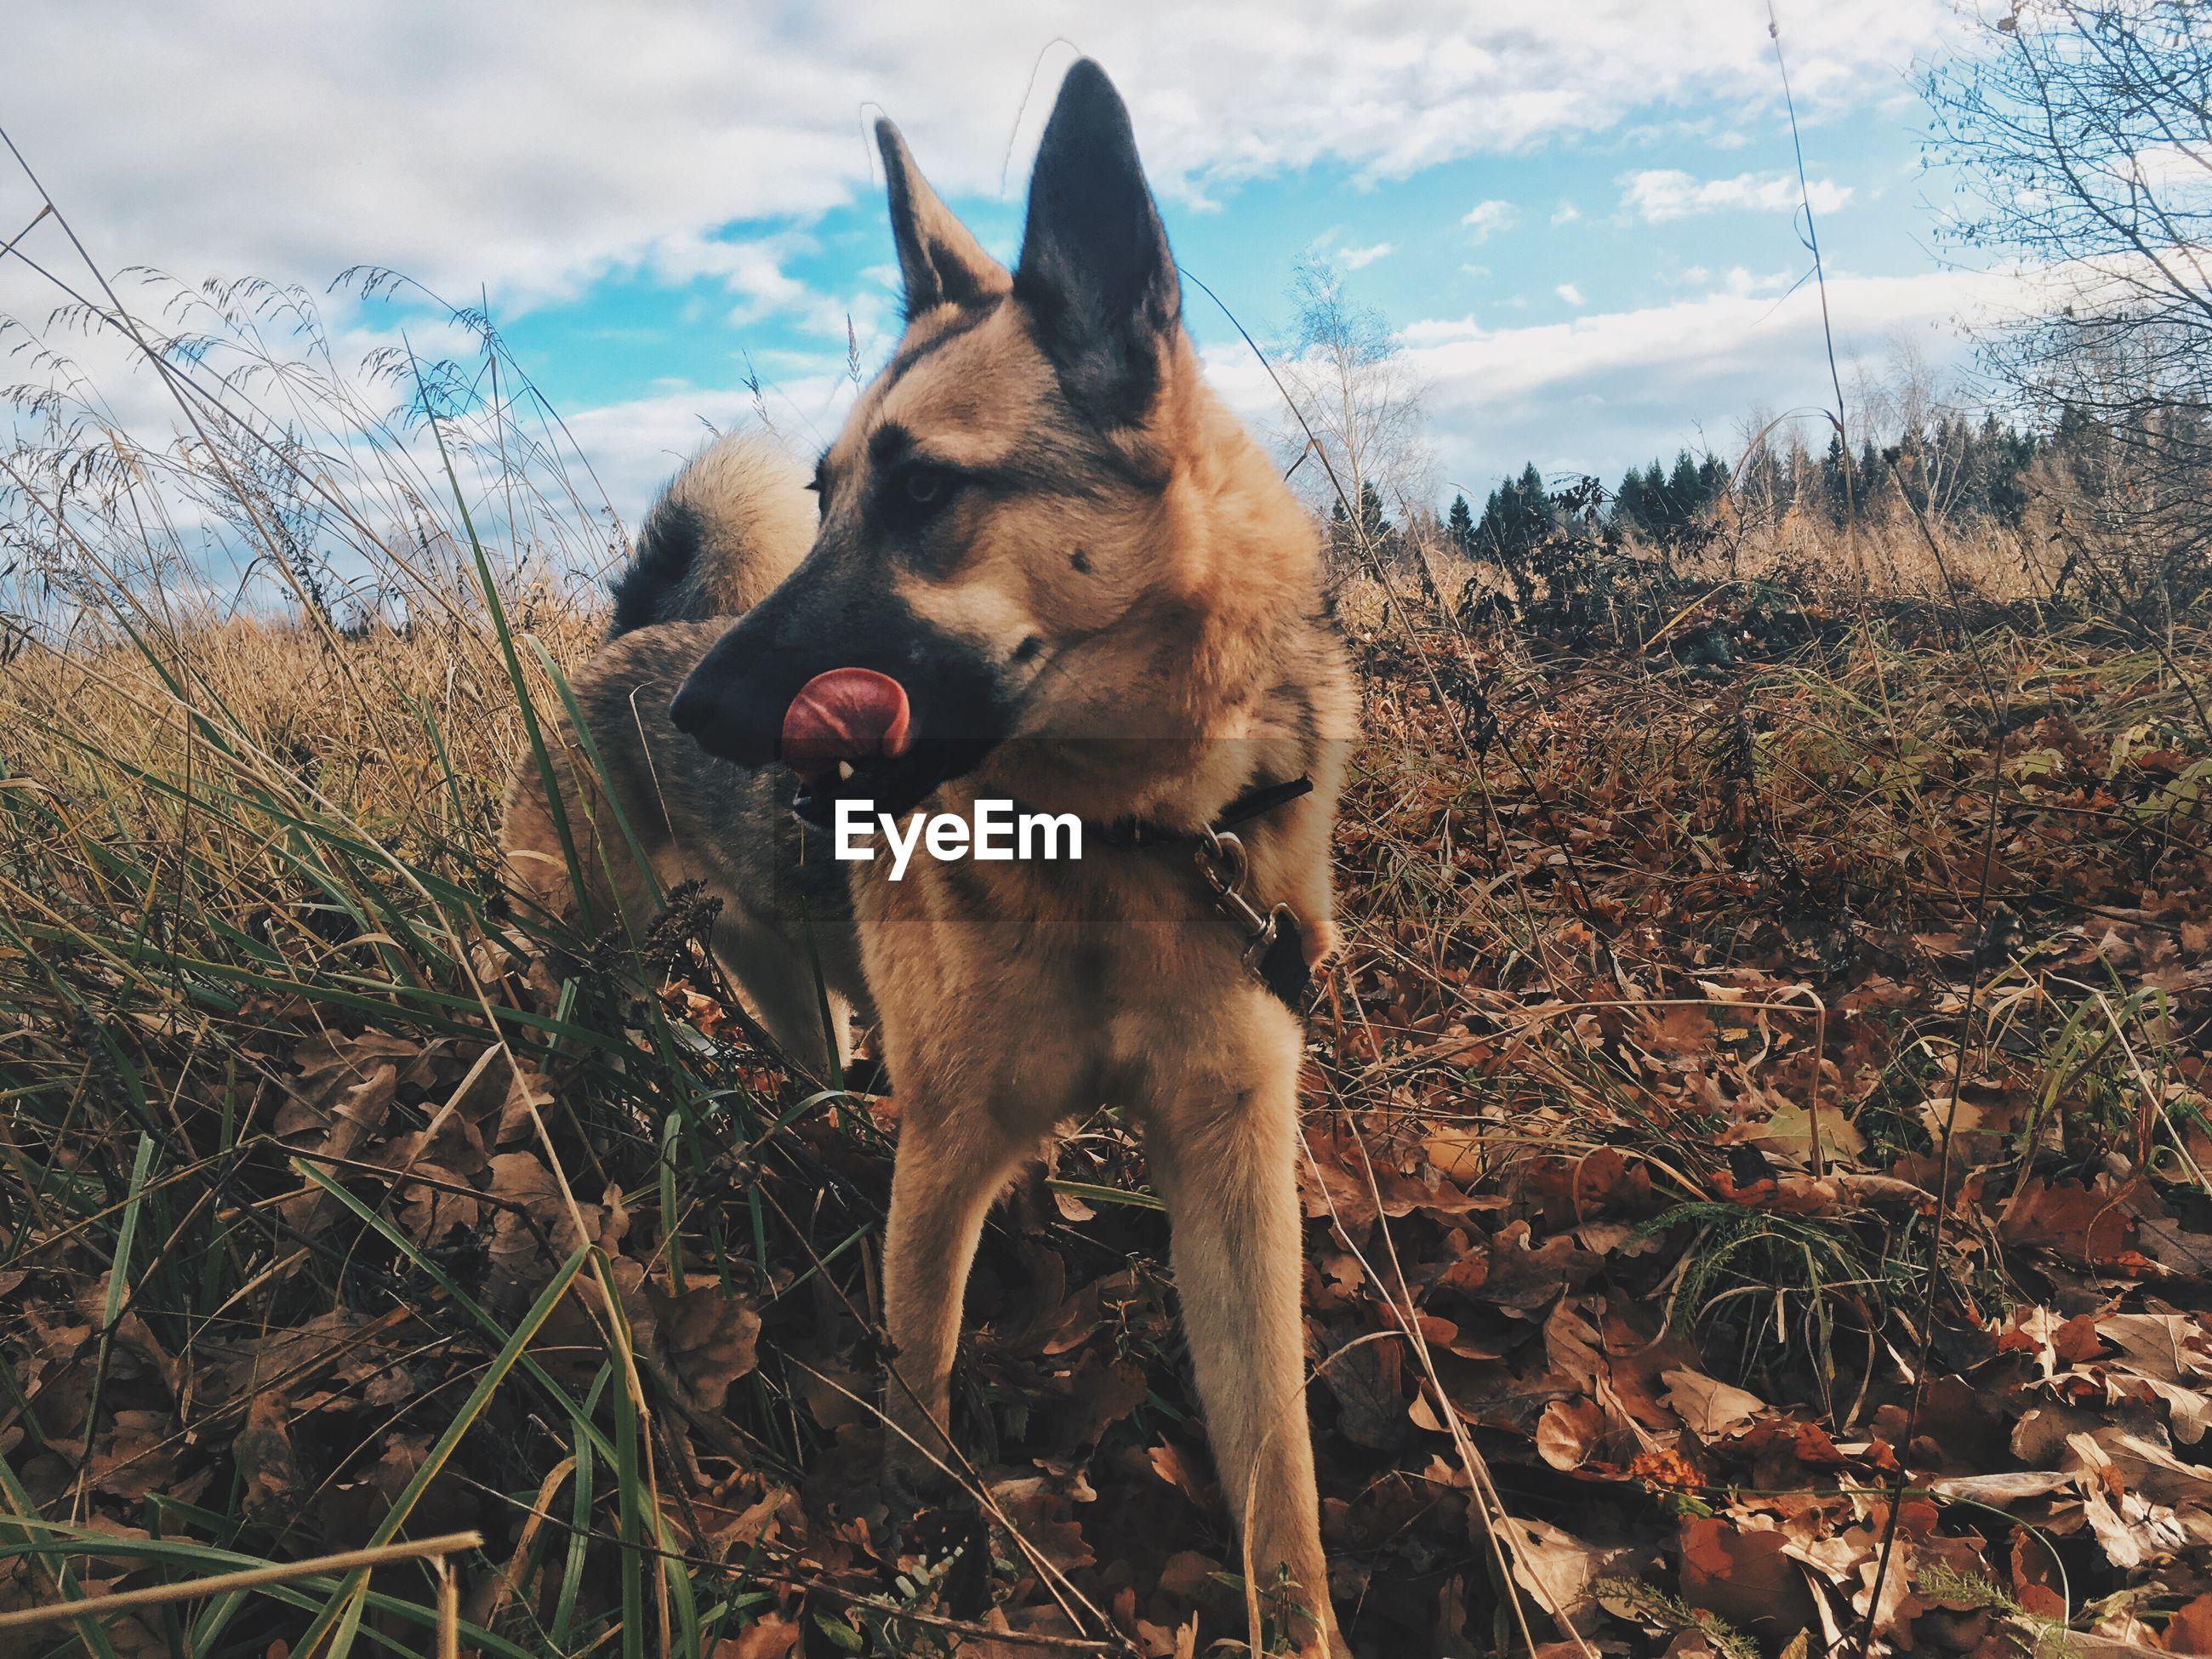 DOG STANDING ON FIELD